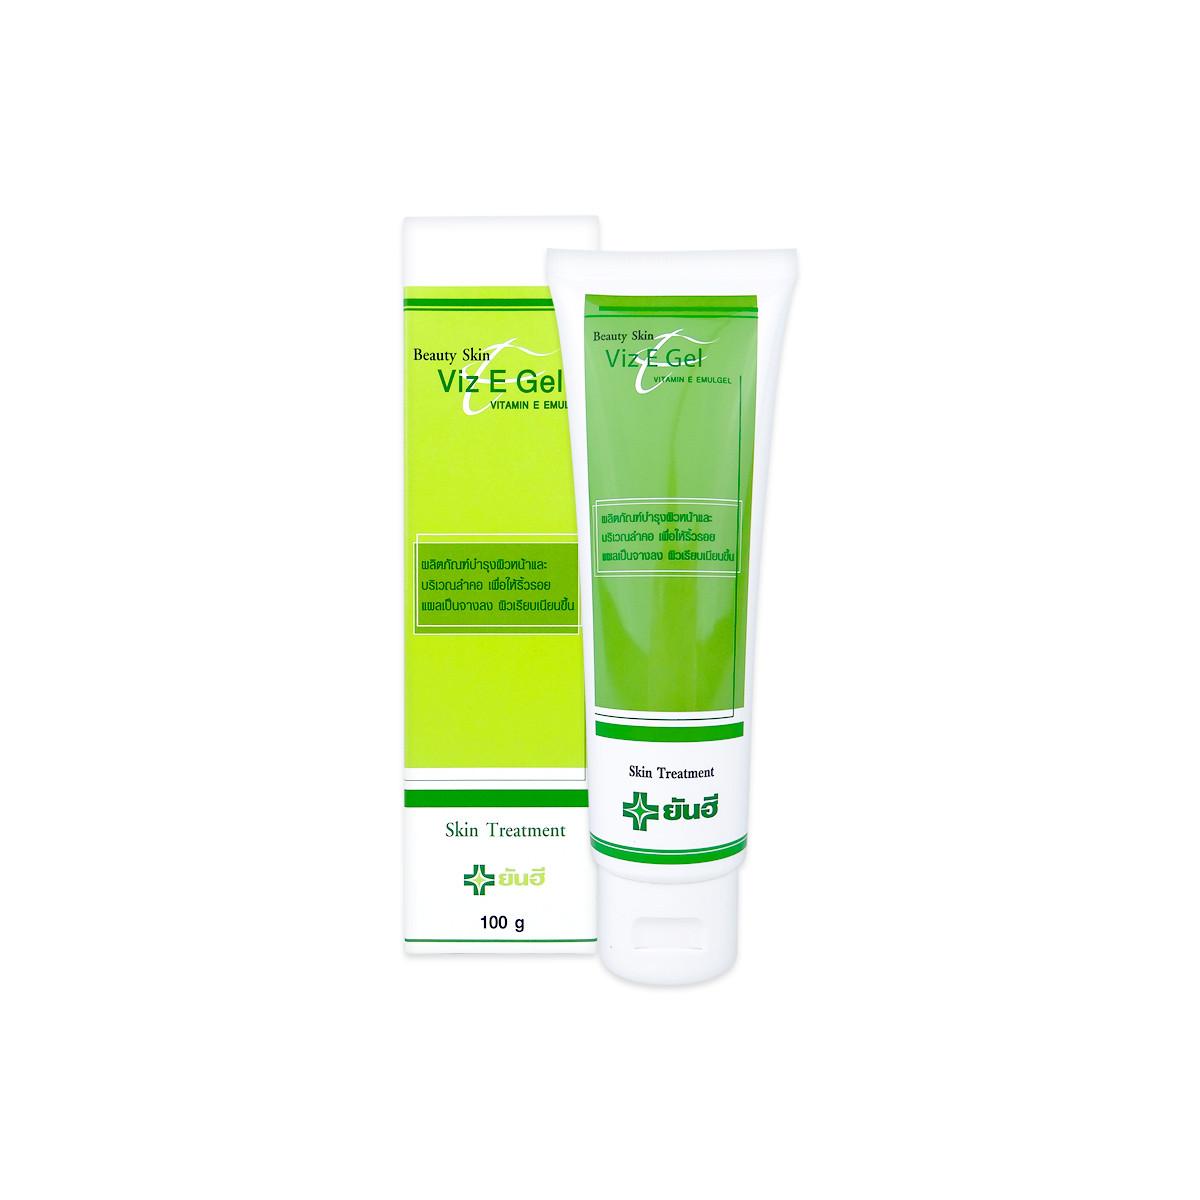 image of 泰國 Yanhee 維他命E凝膠 100g    Thailand Yanhee Beauty Skin Viz E Gel 100g